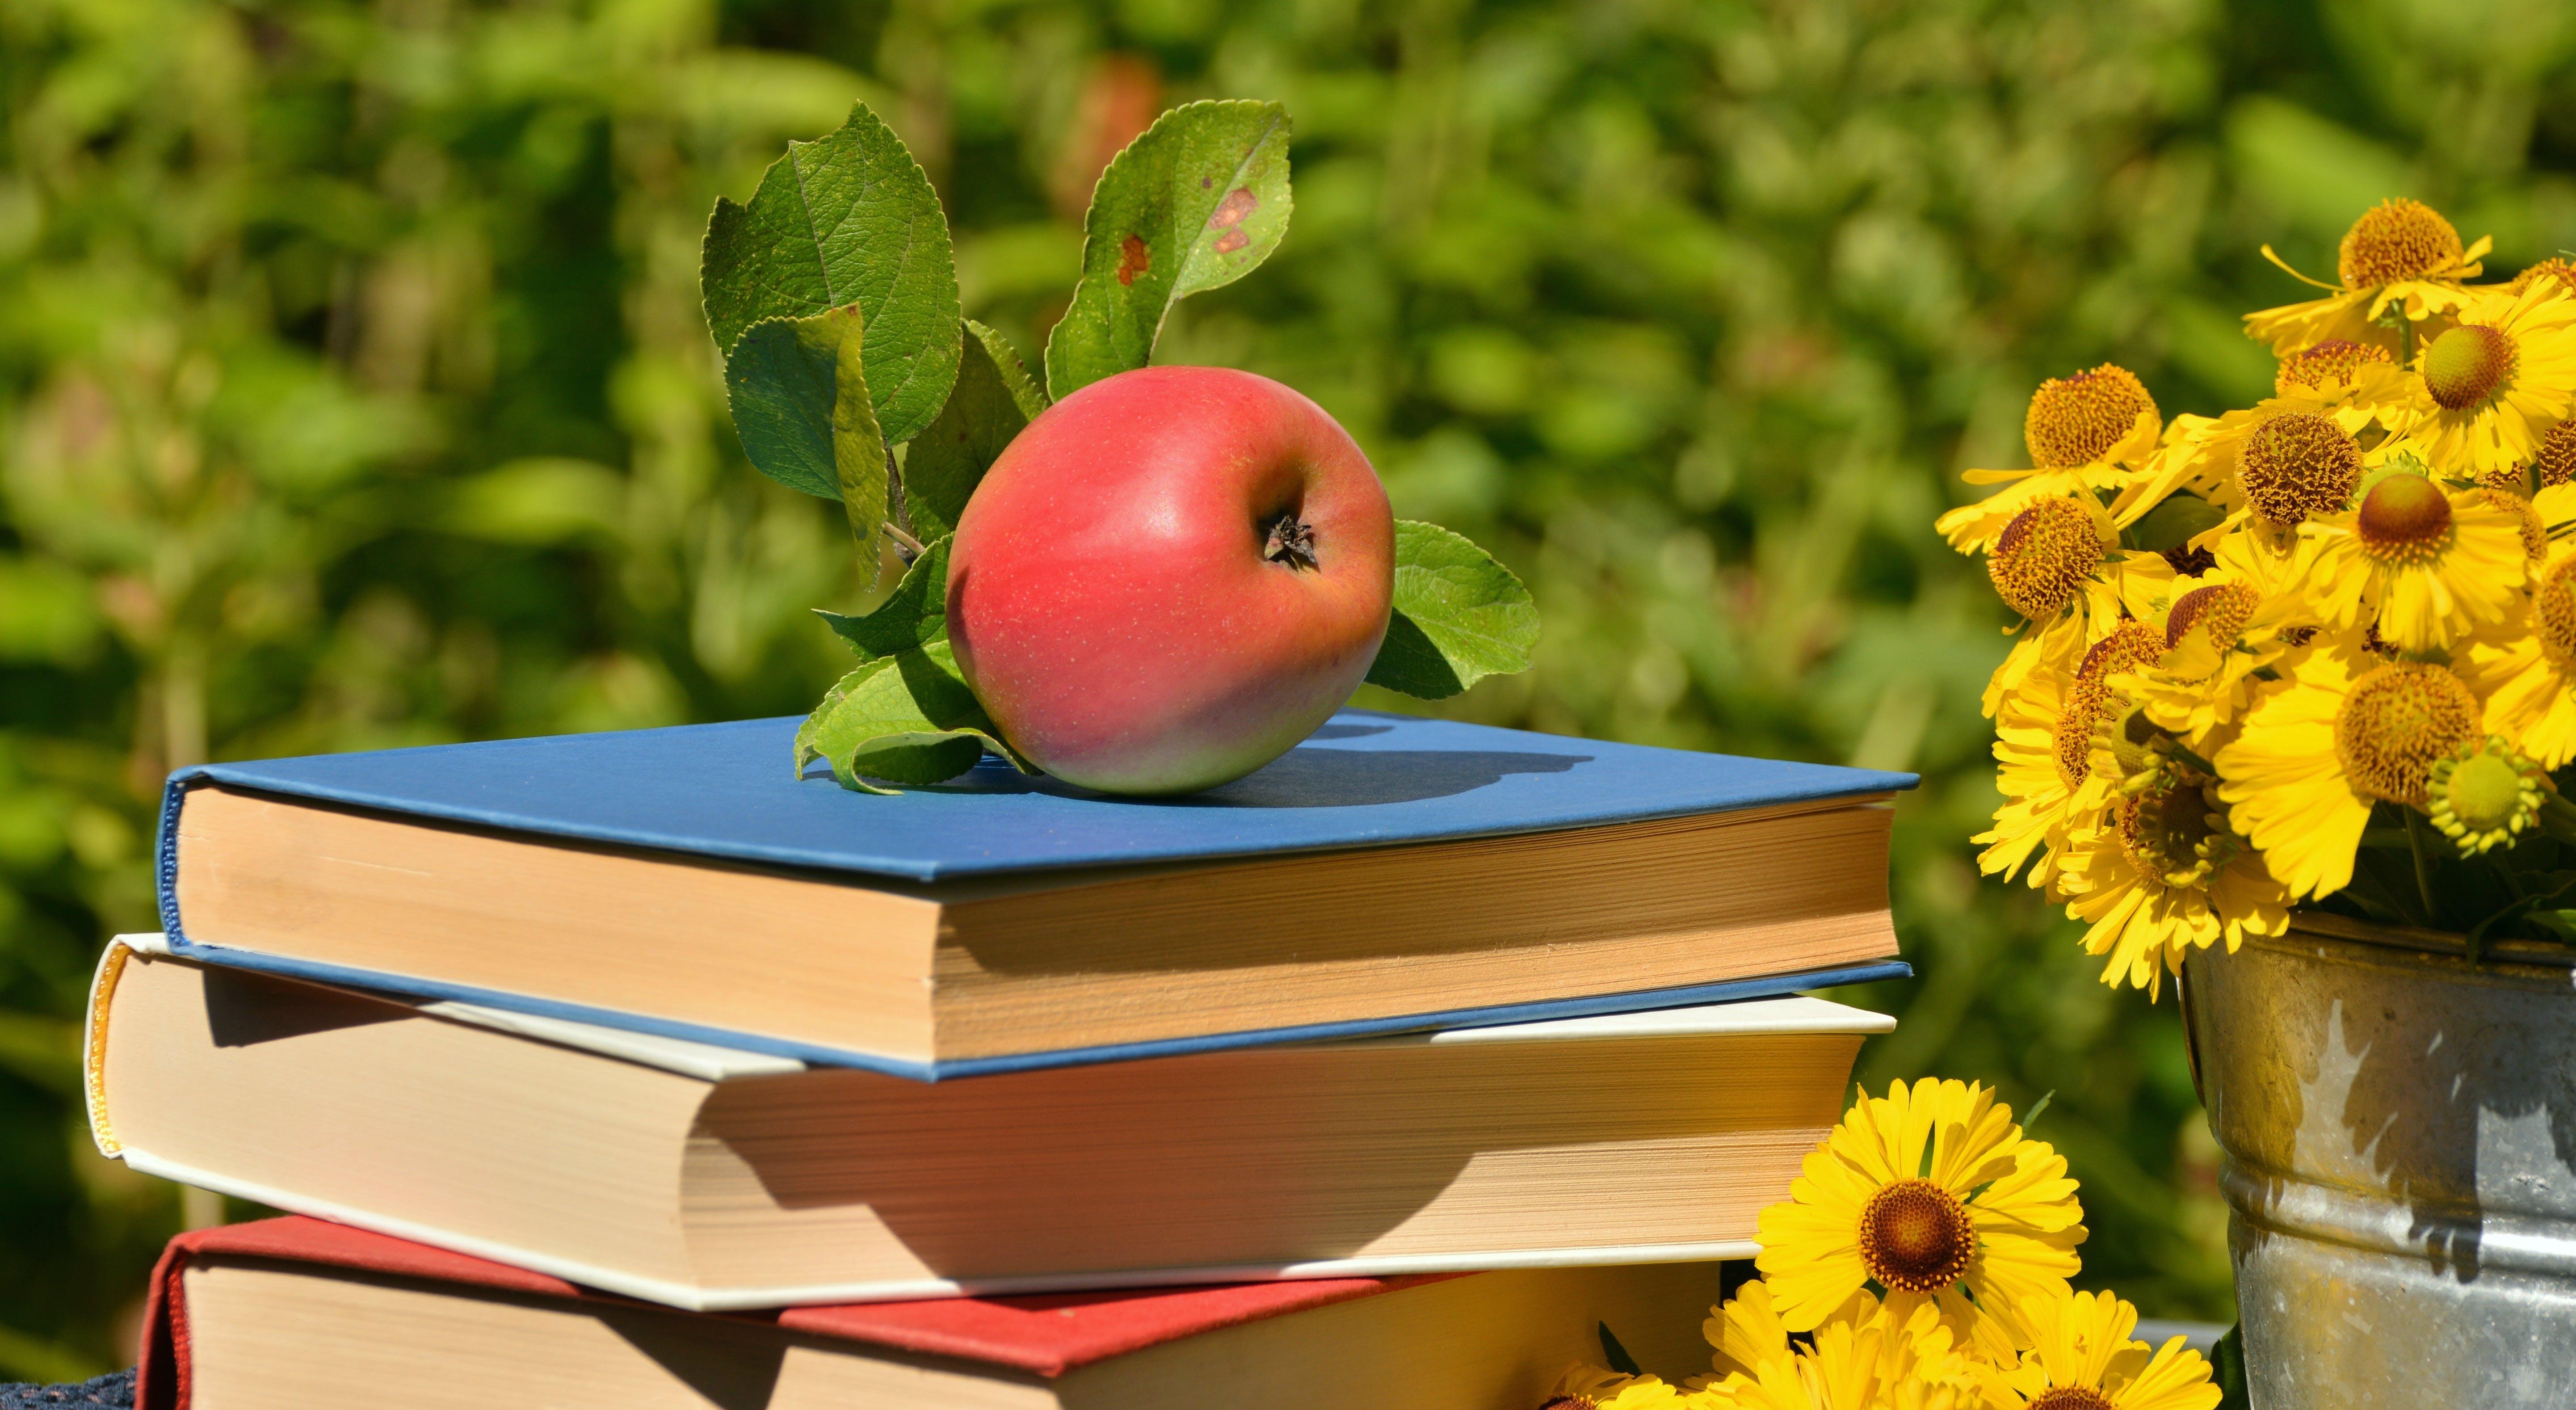 Free stock photo of apple, books, break, browse